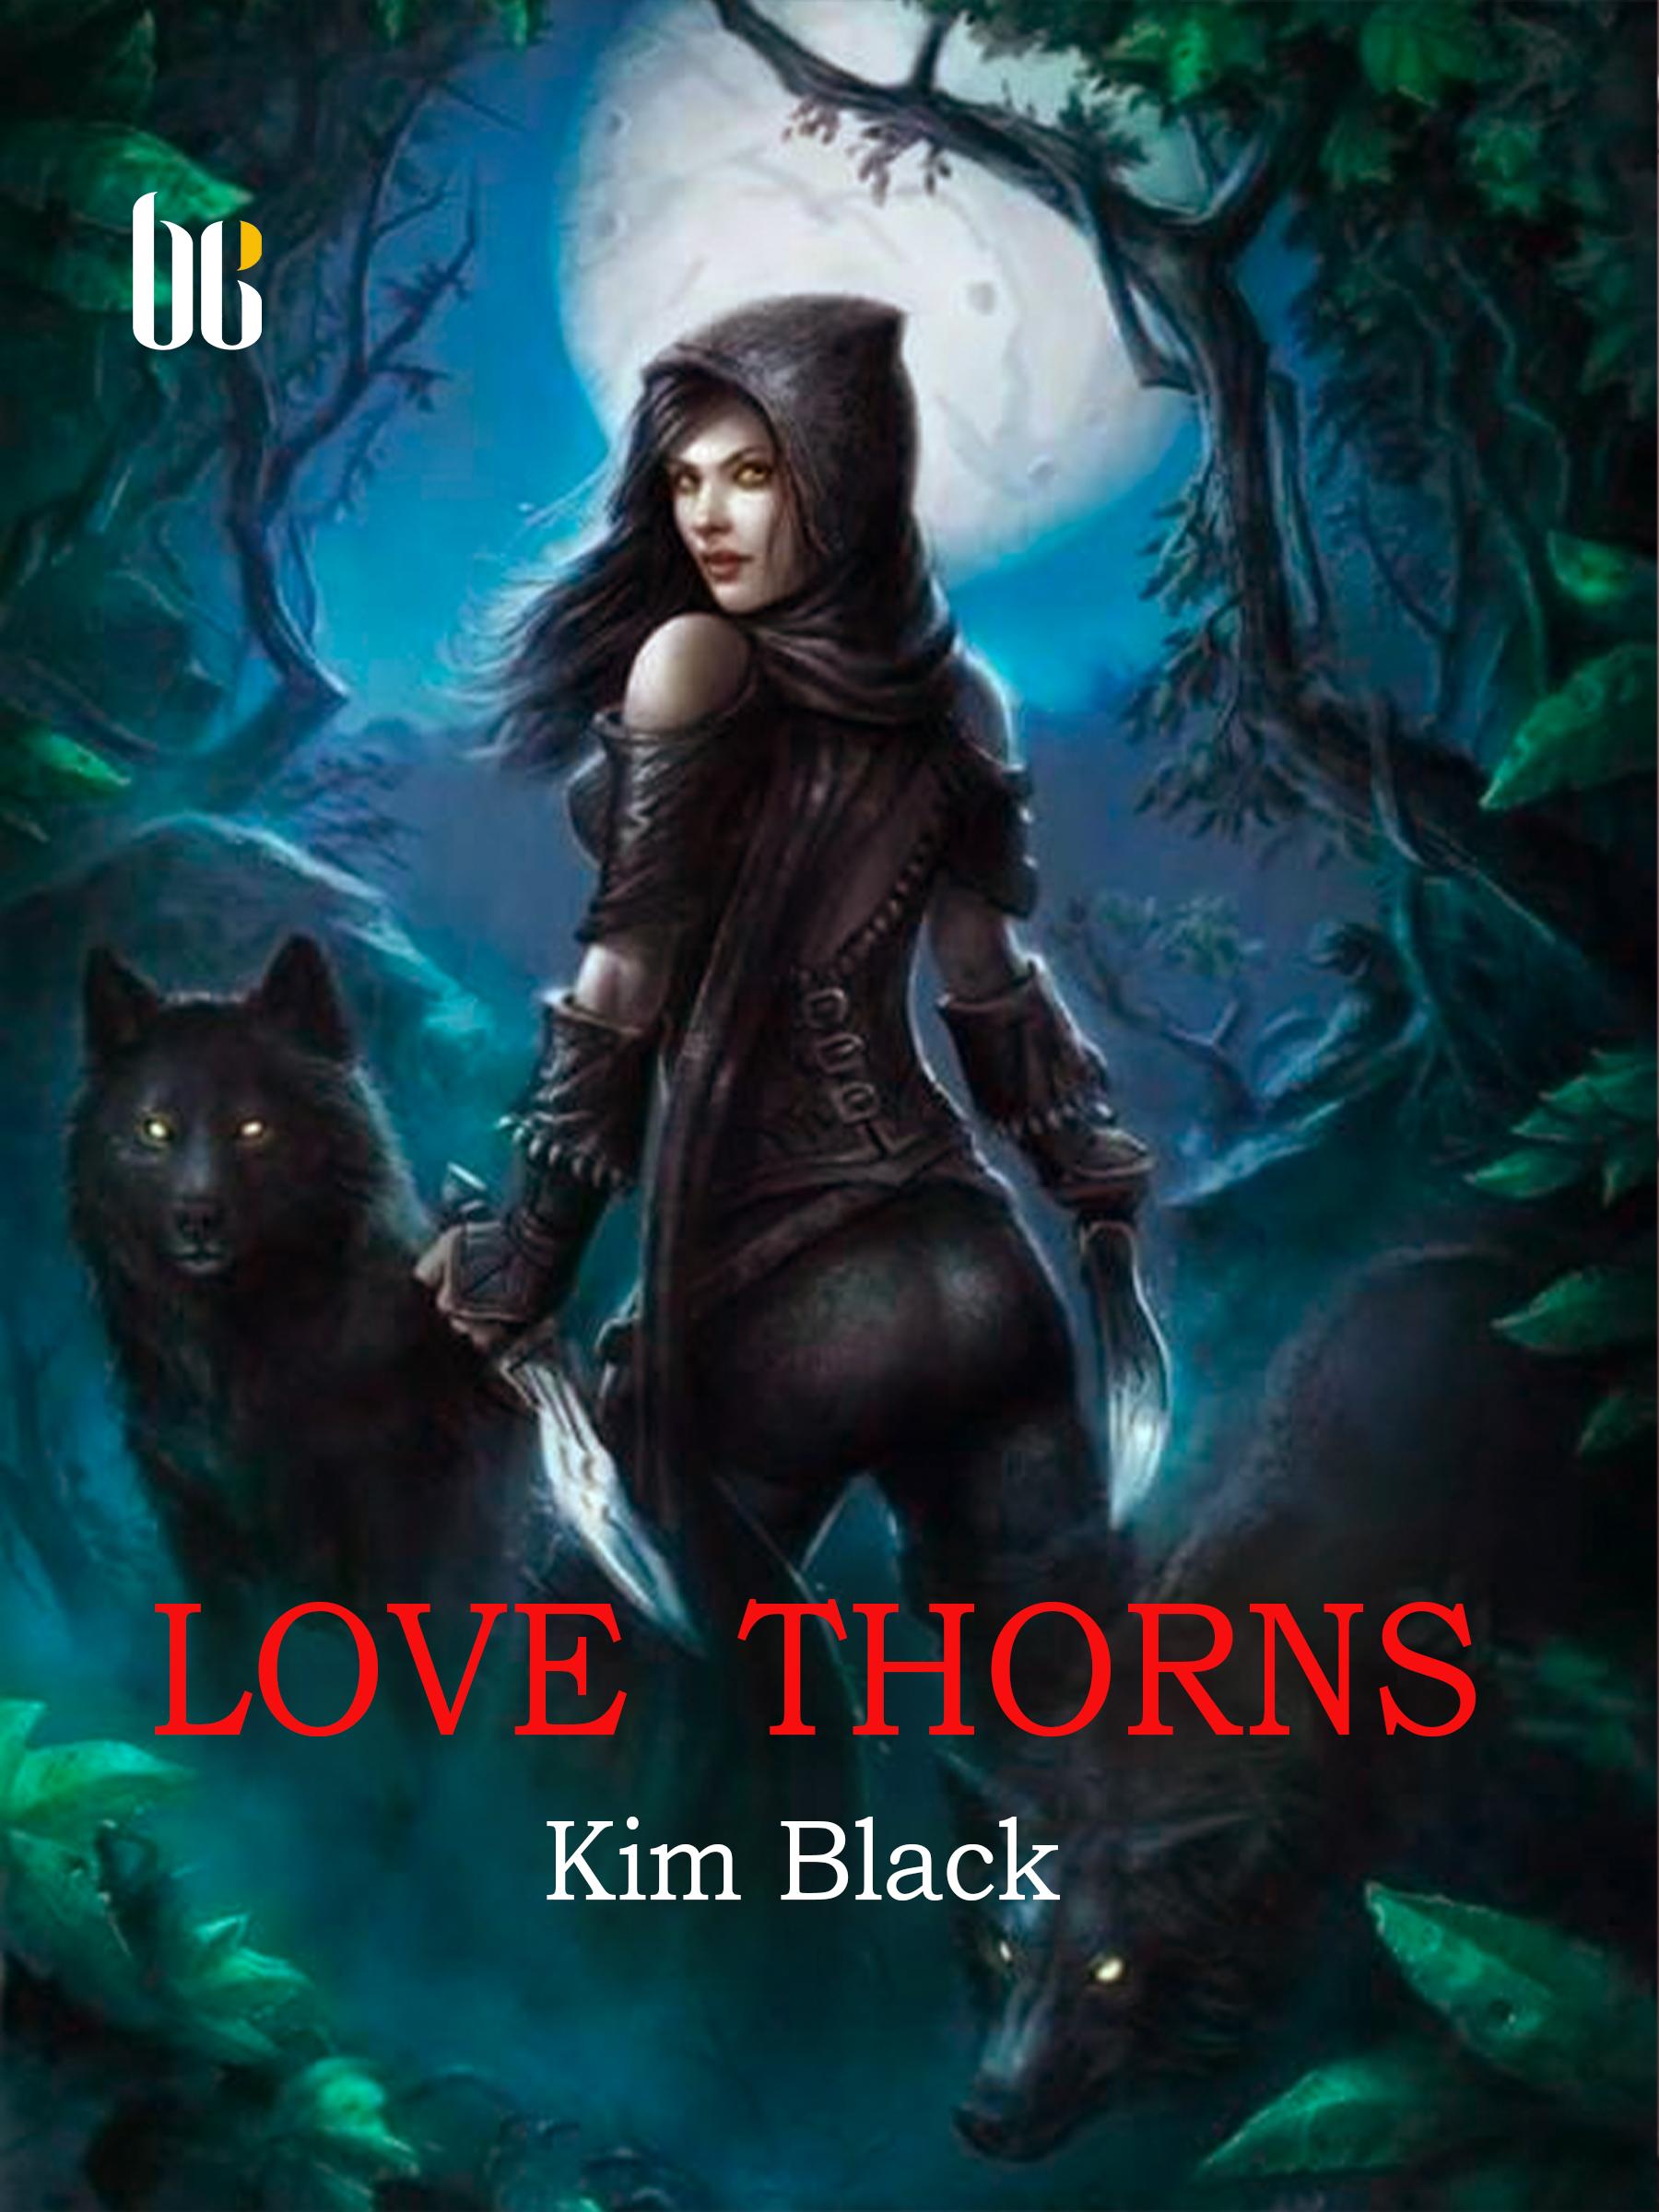 Love Thorns